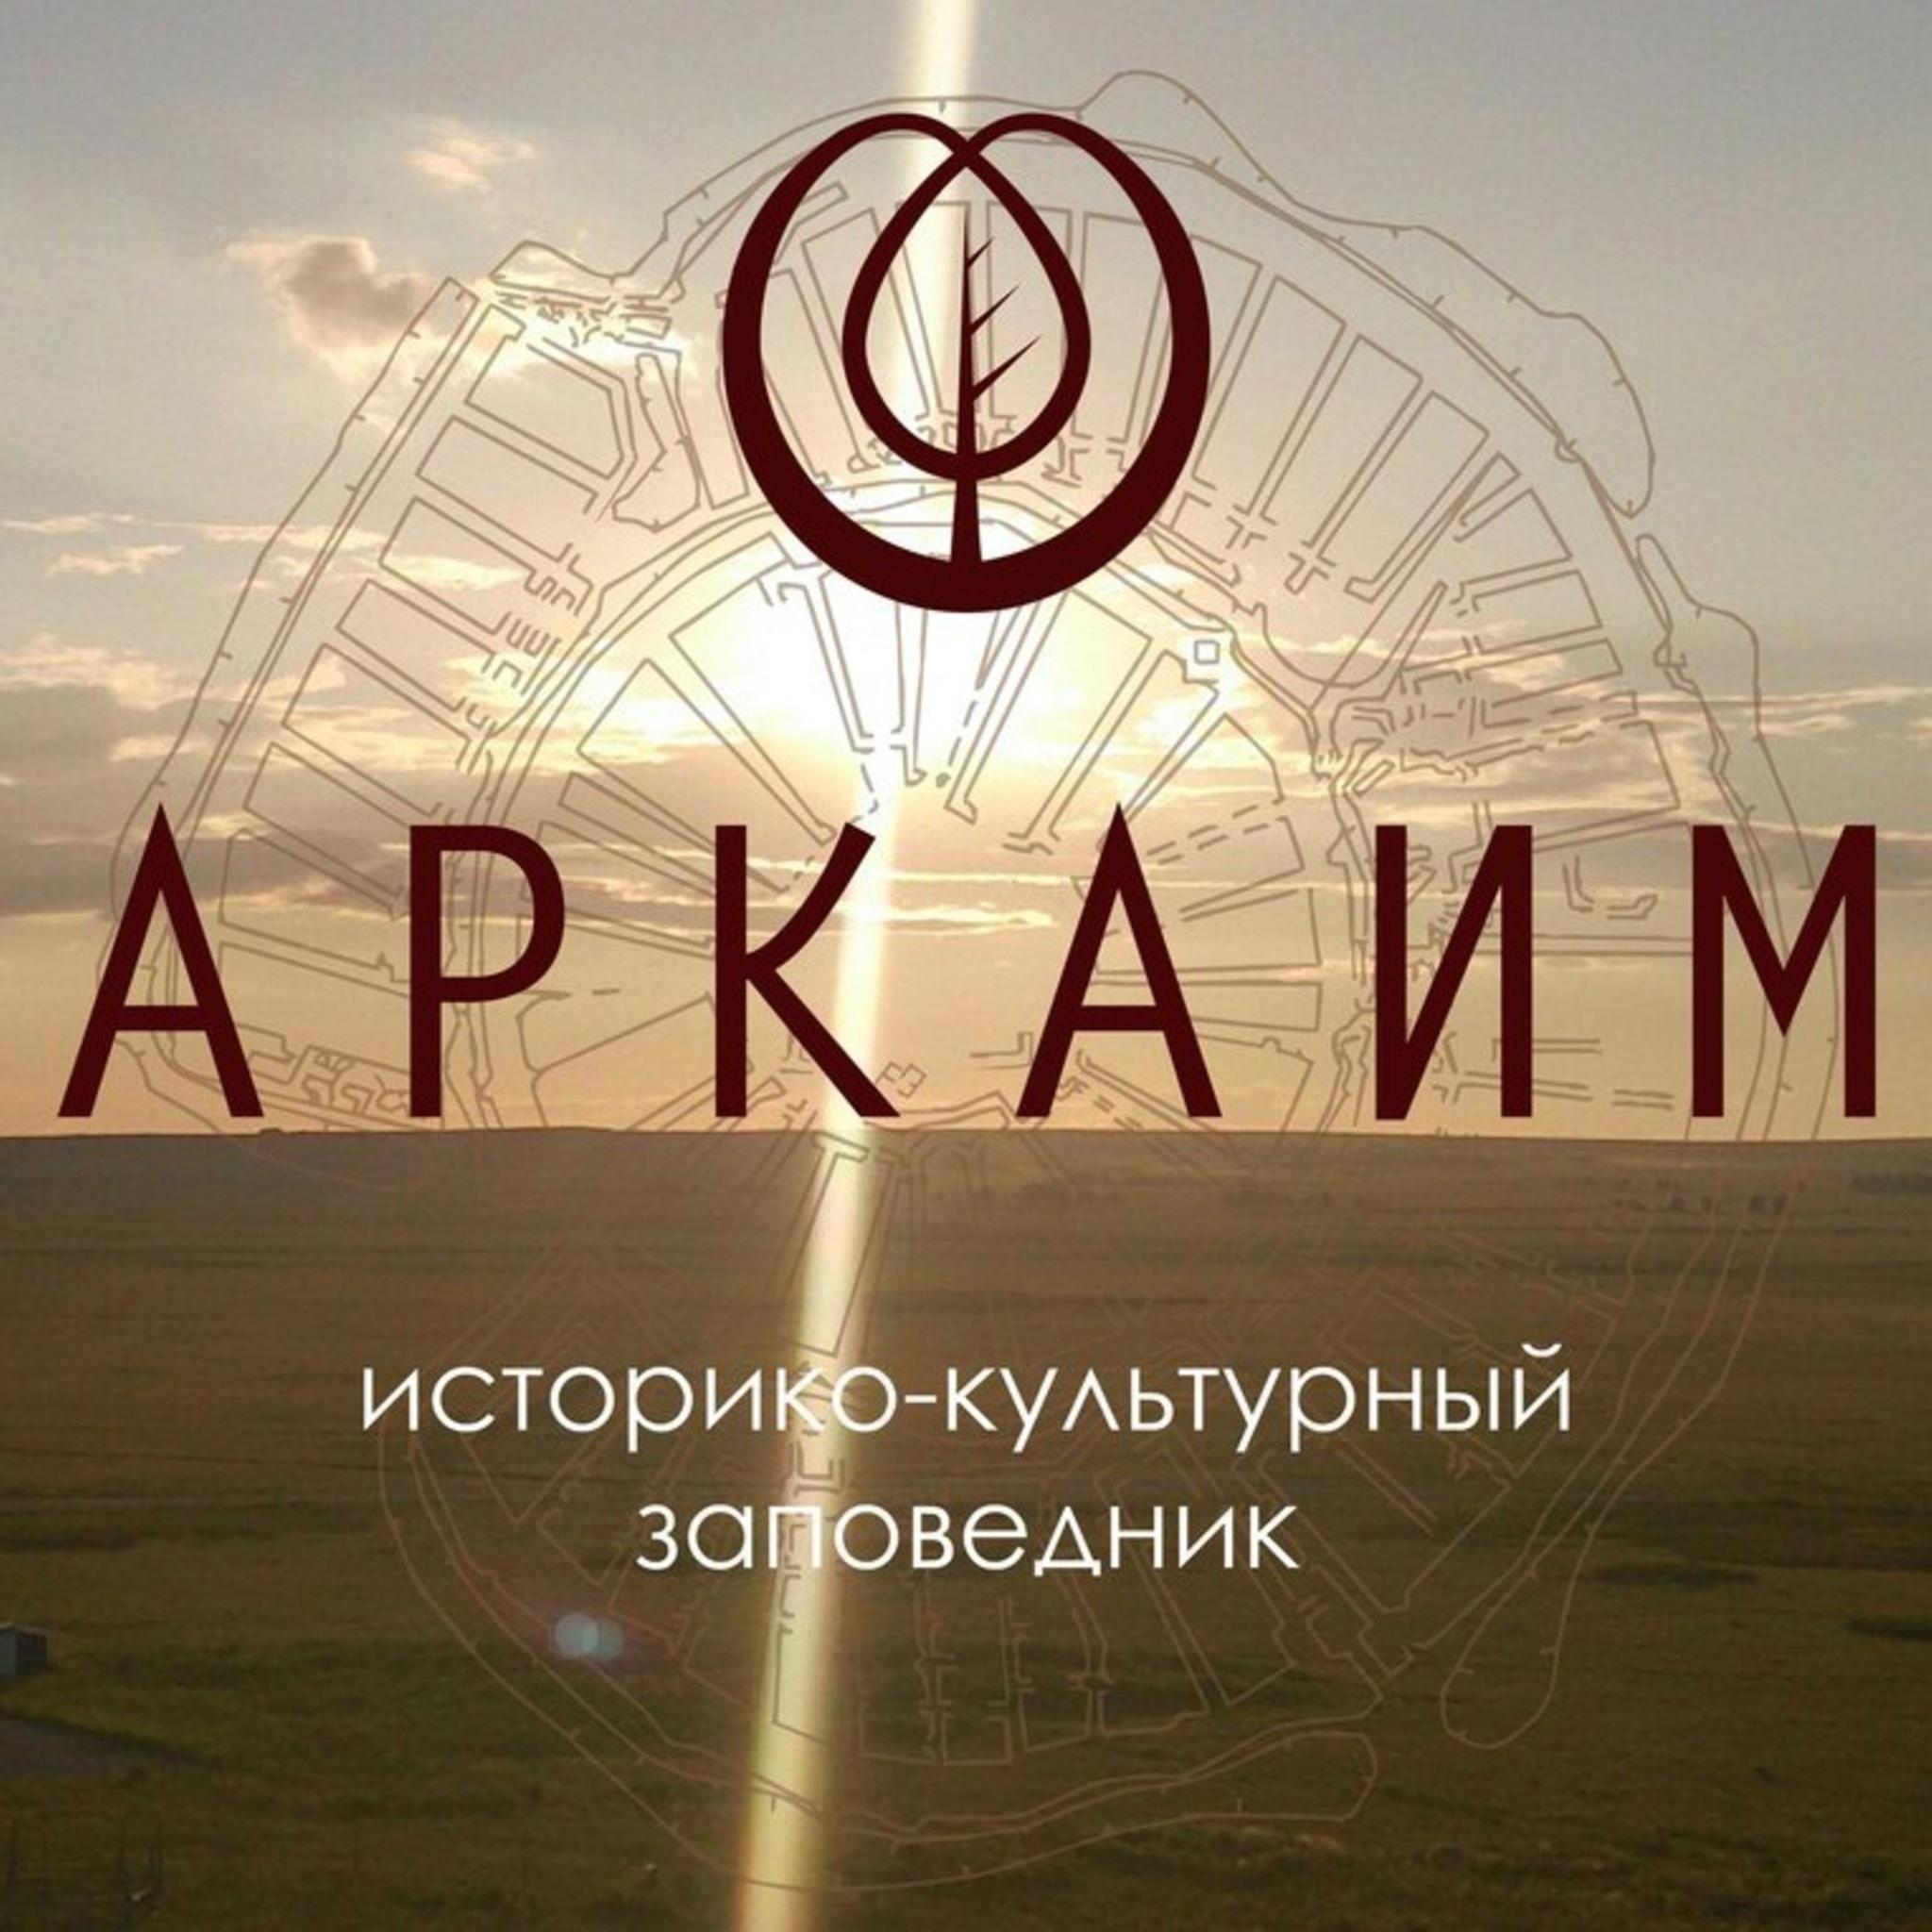 Chelyabinsk state historical and cultural reserve ARKAIM